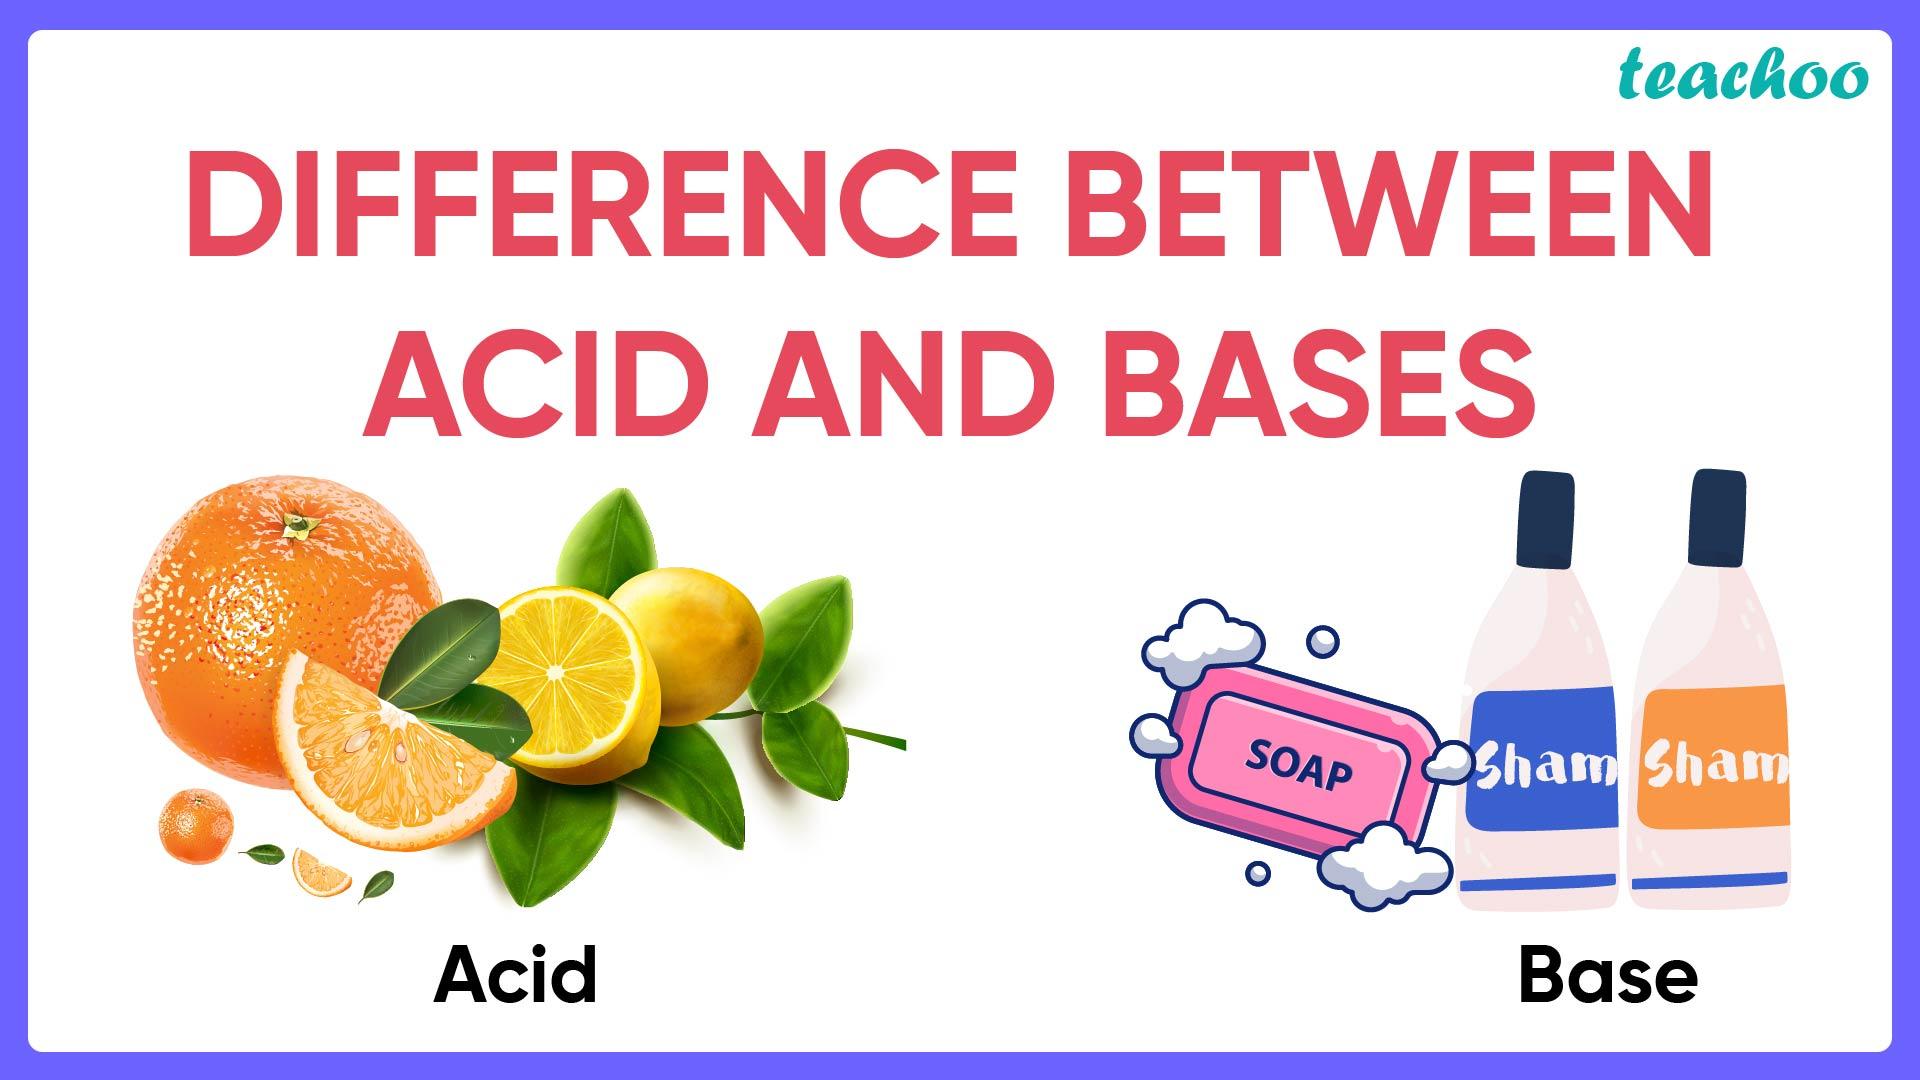 Difference between Acid and Bases-Teachoo.jpg